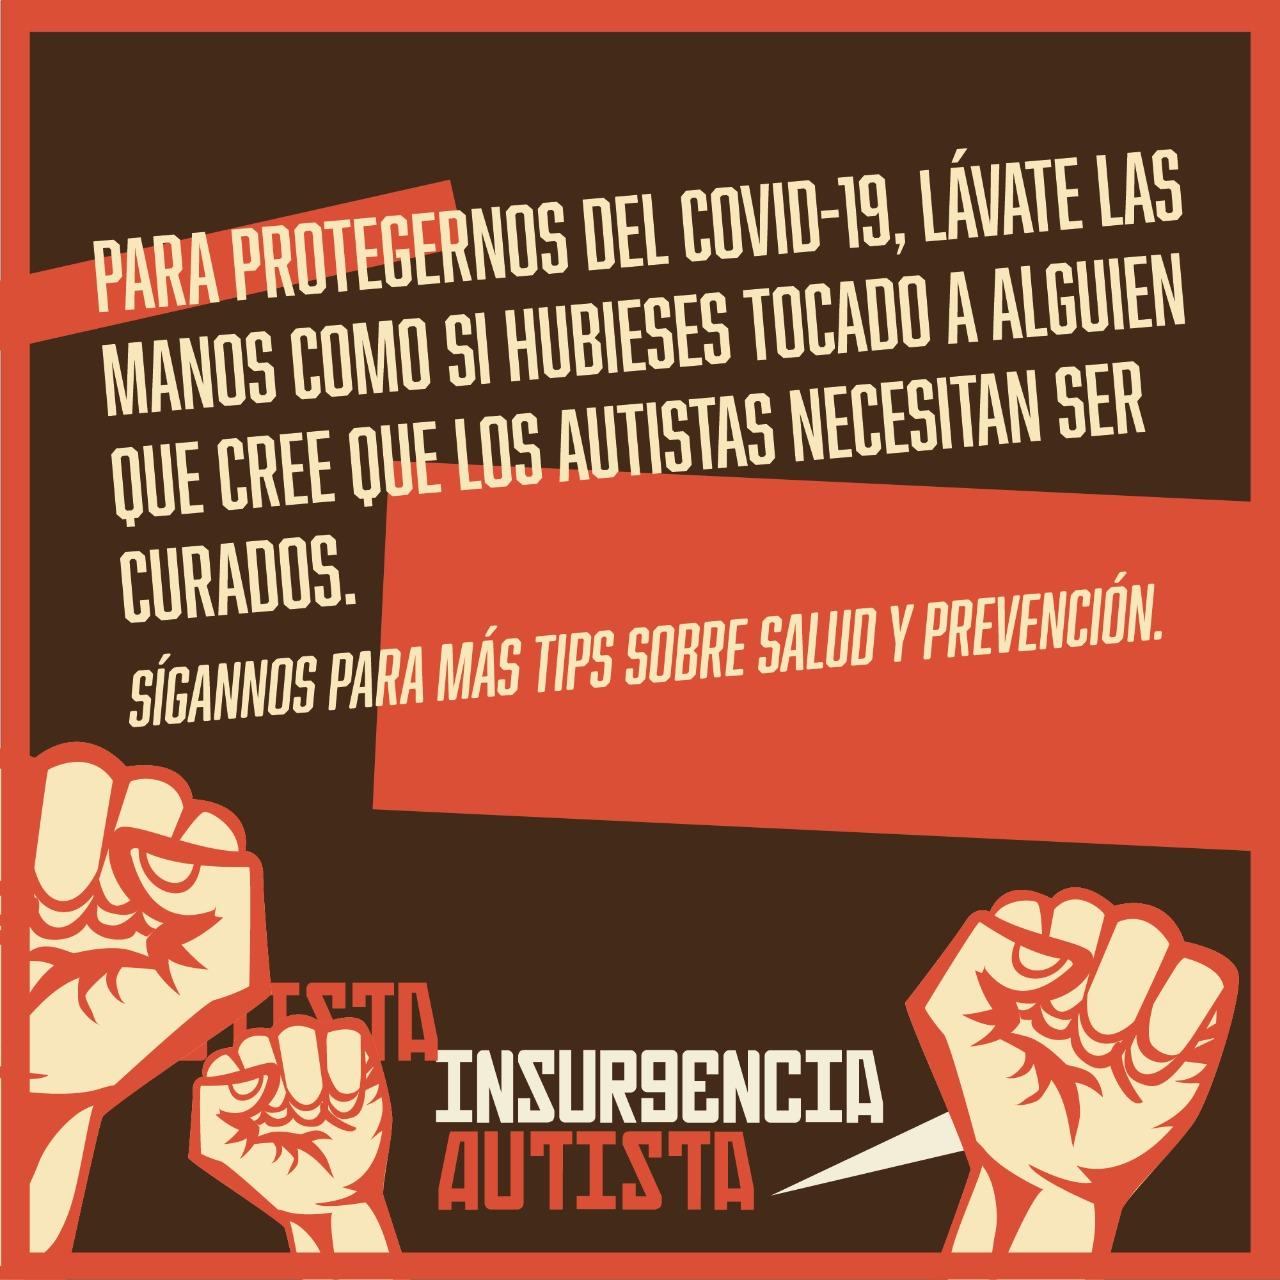 Insurgencia00020